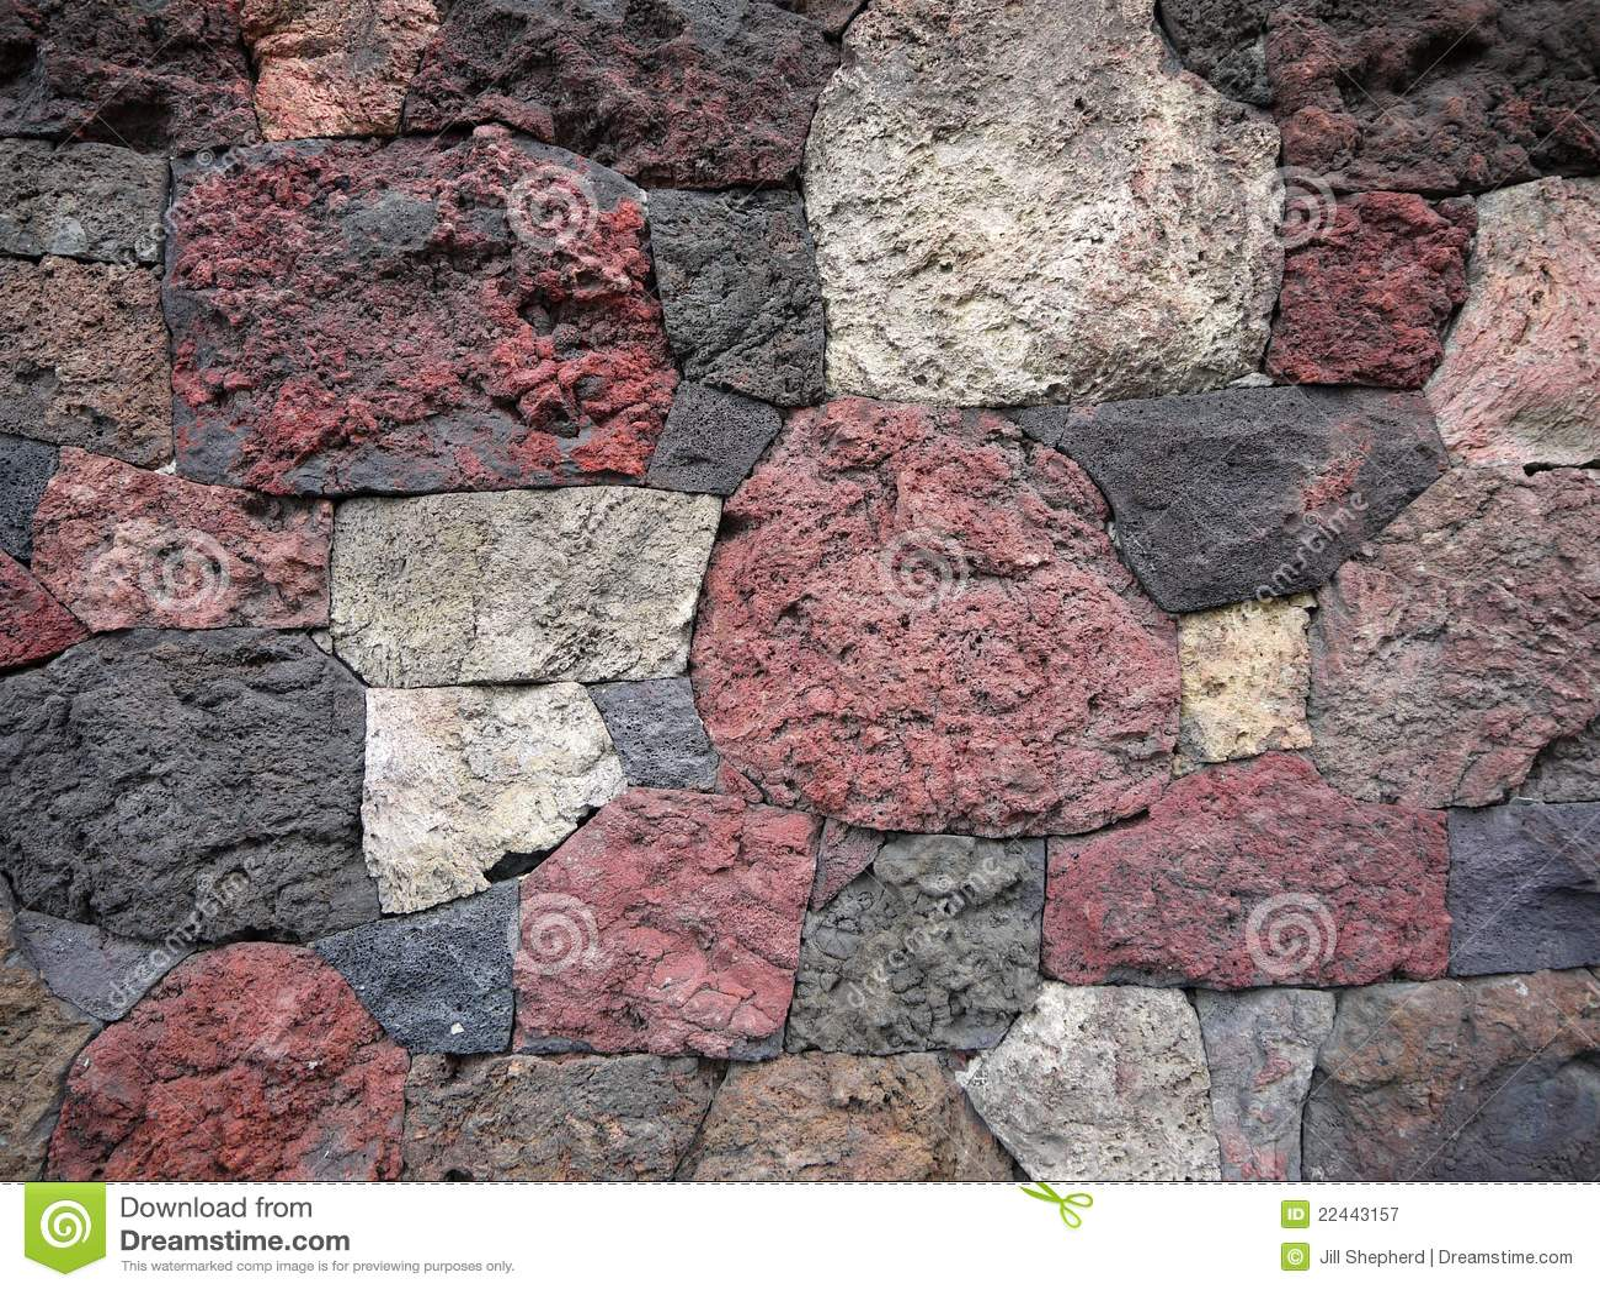 Garden Scoria Lava Rock Wall Royalty Free Stock